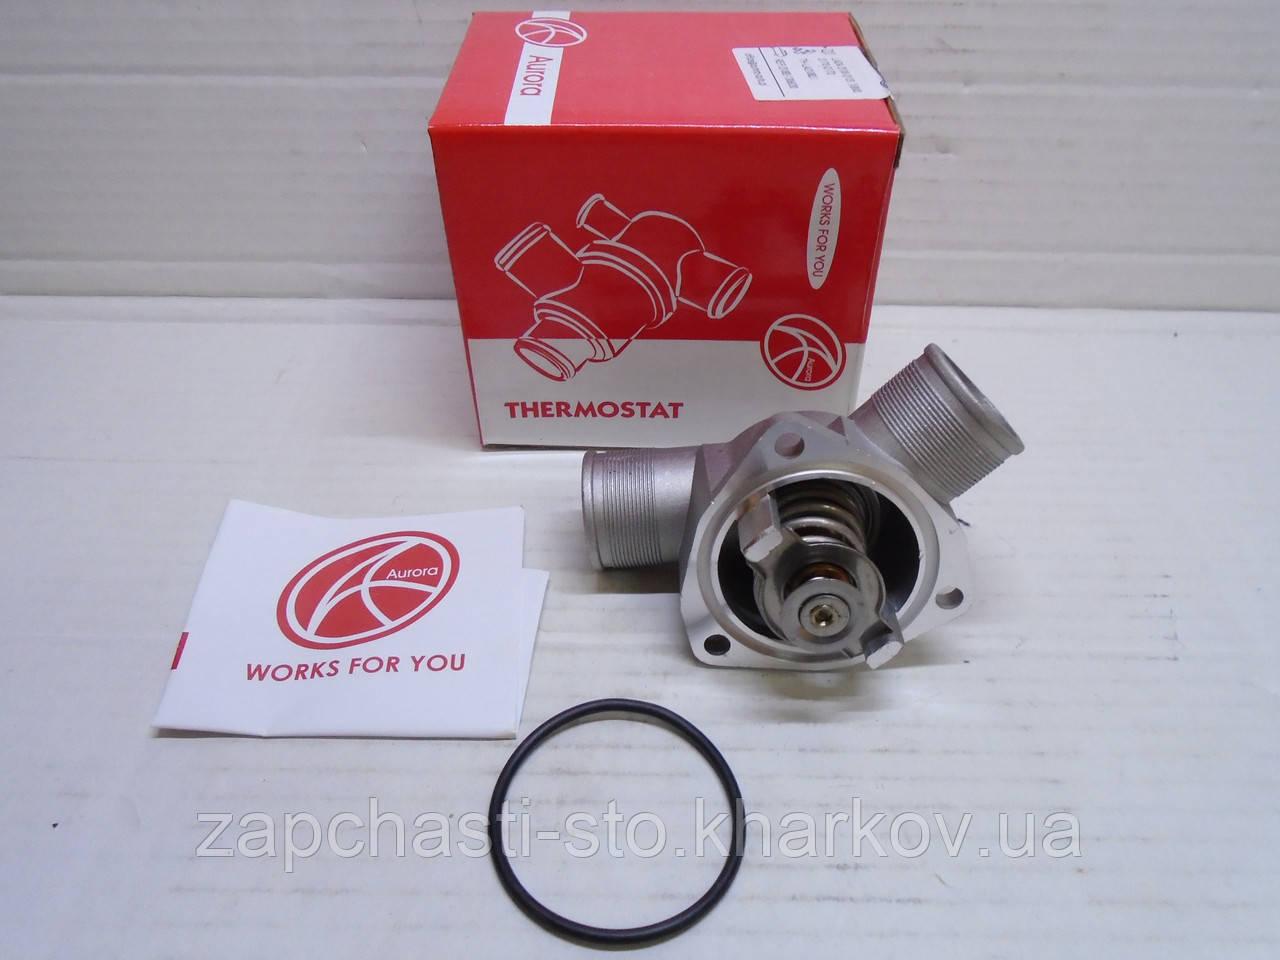 Термостат ВАЗ 2110-2115 инжектор AURORA